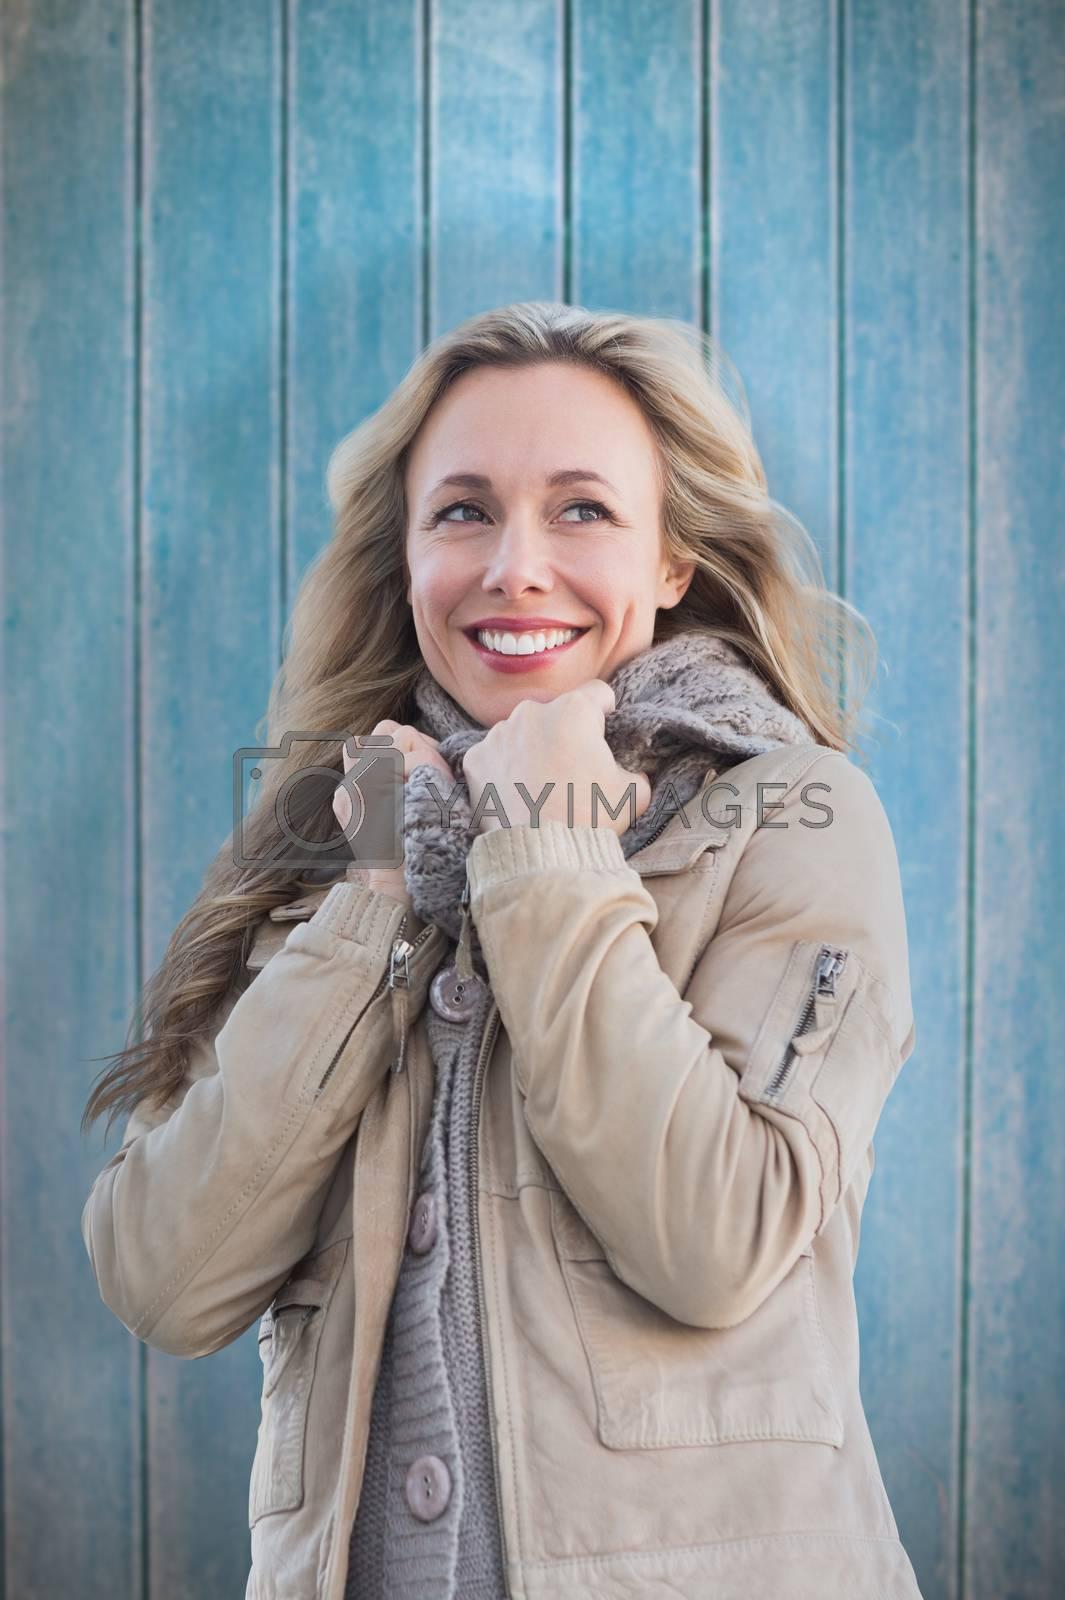 Smiling blonde against wooden planks